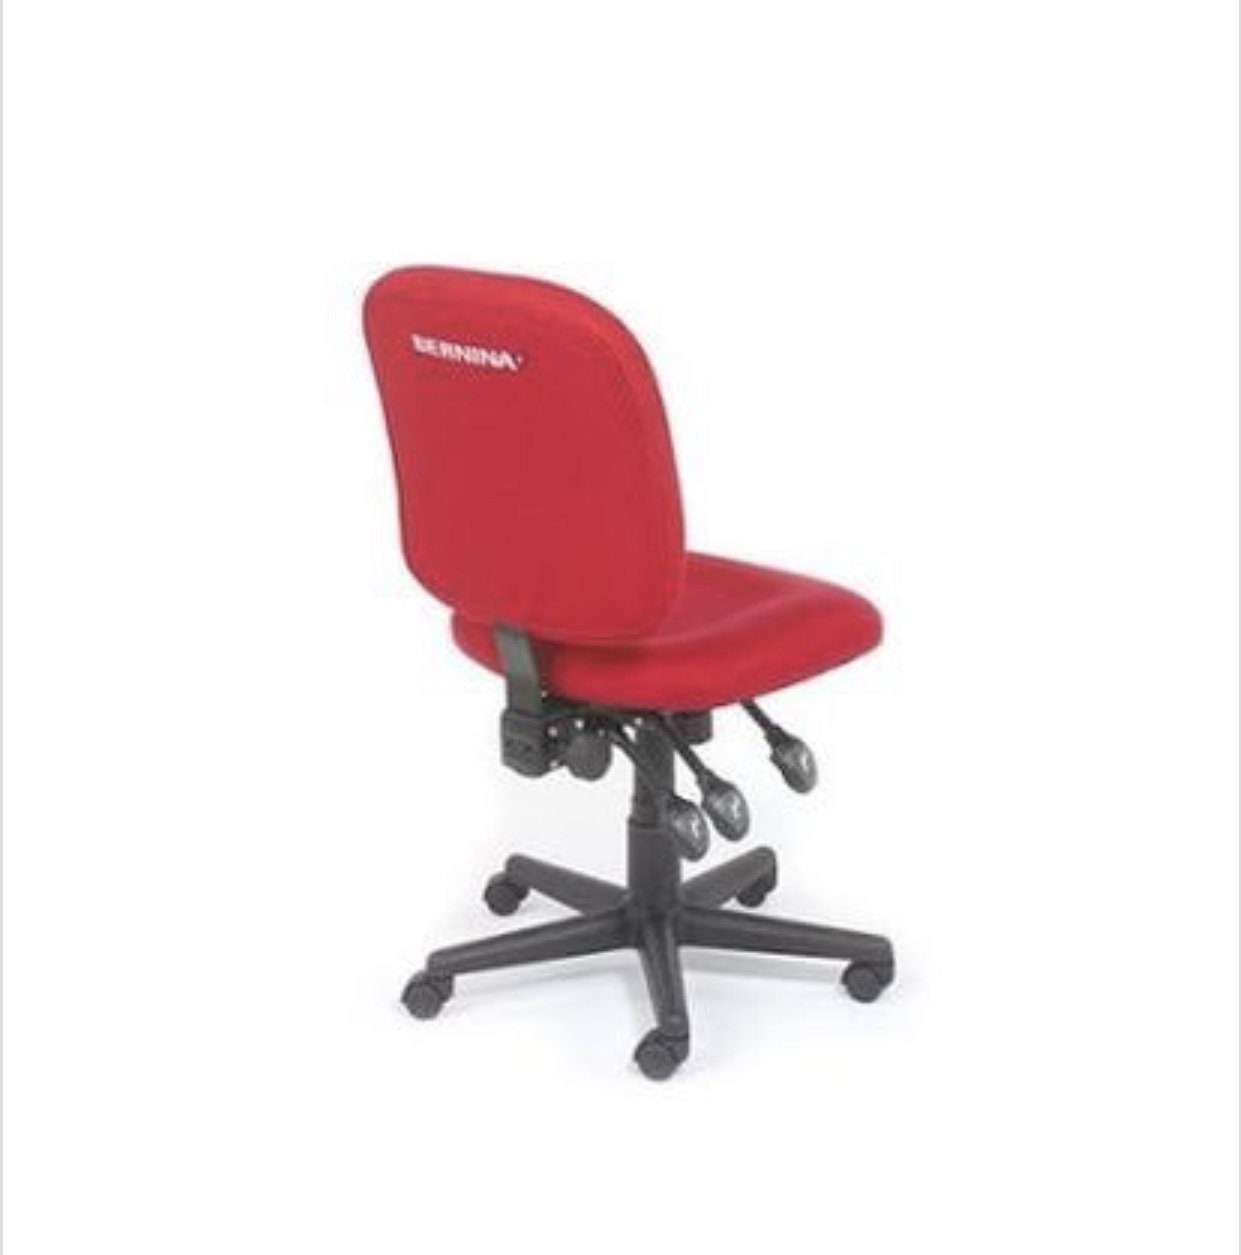 Bernina Red Chair